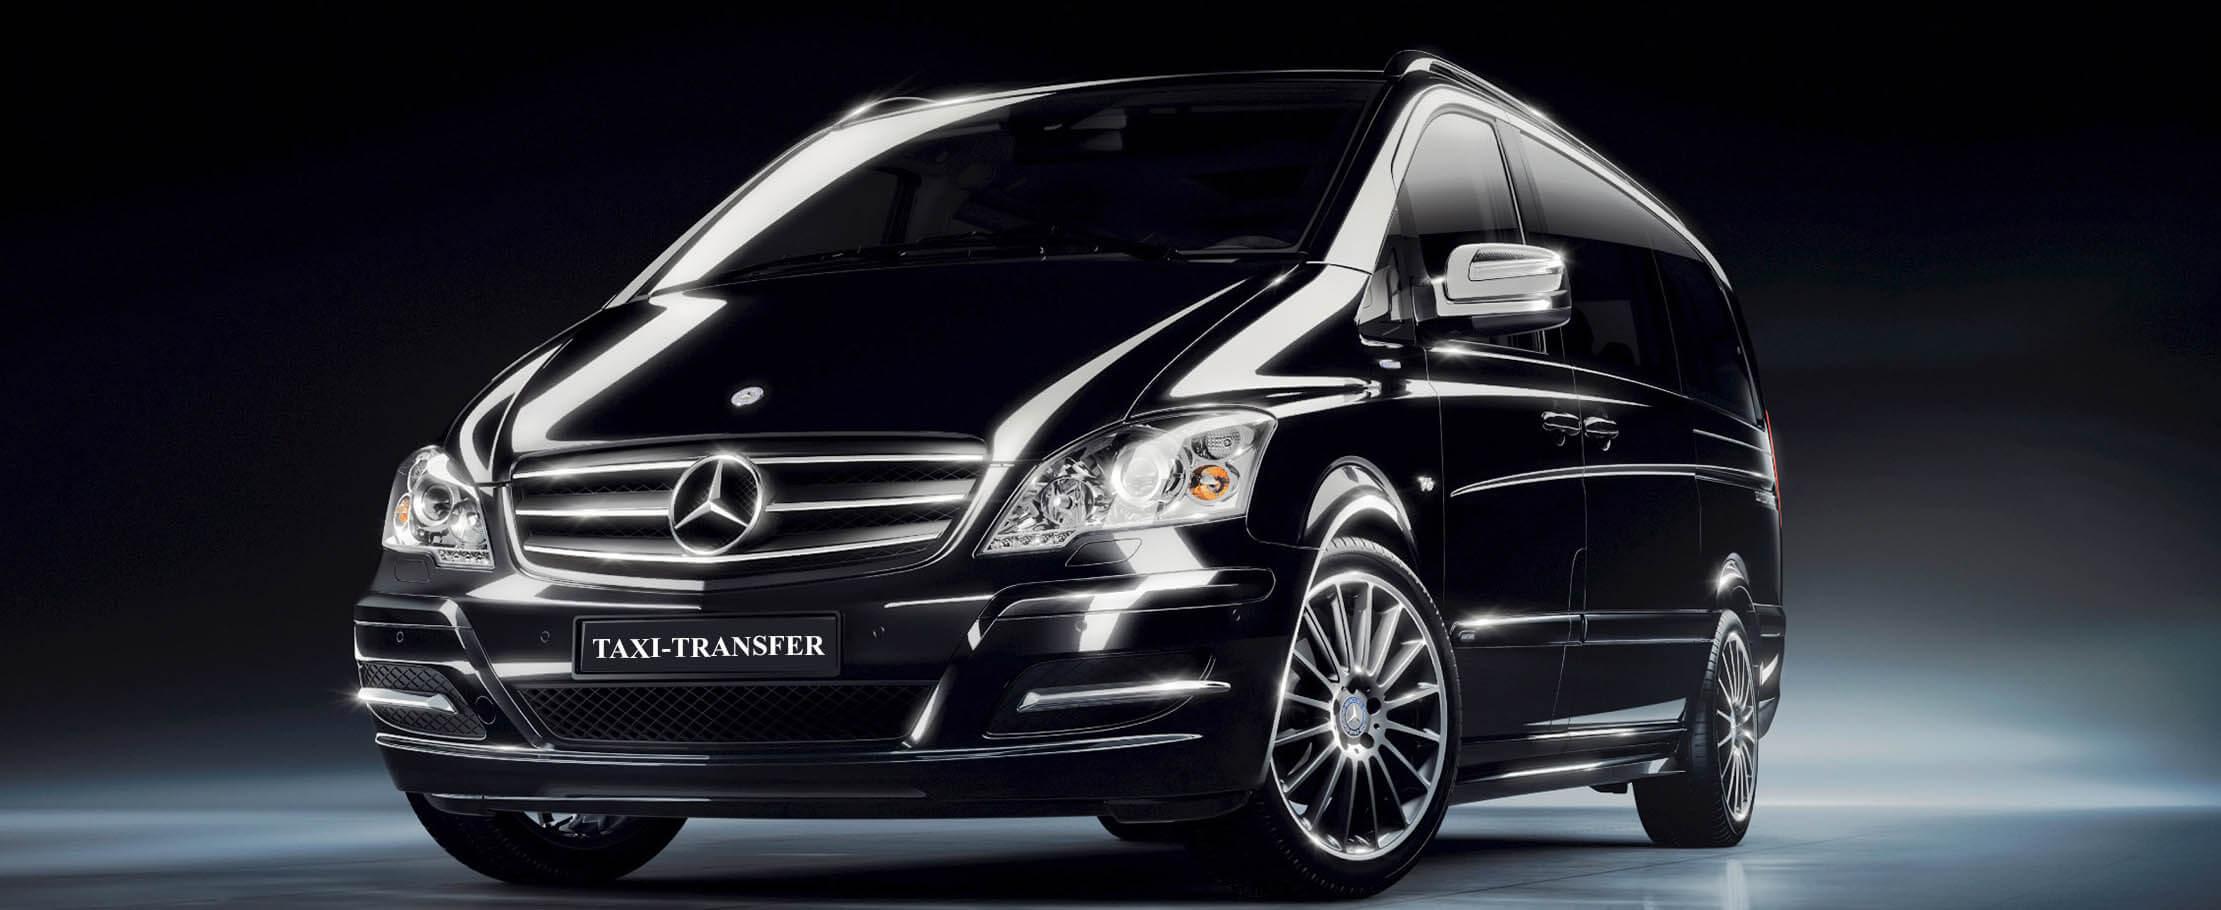 Flotta Mercedes Taxi Transfer